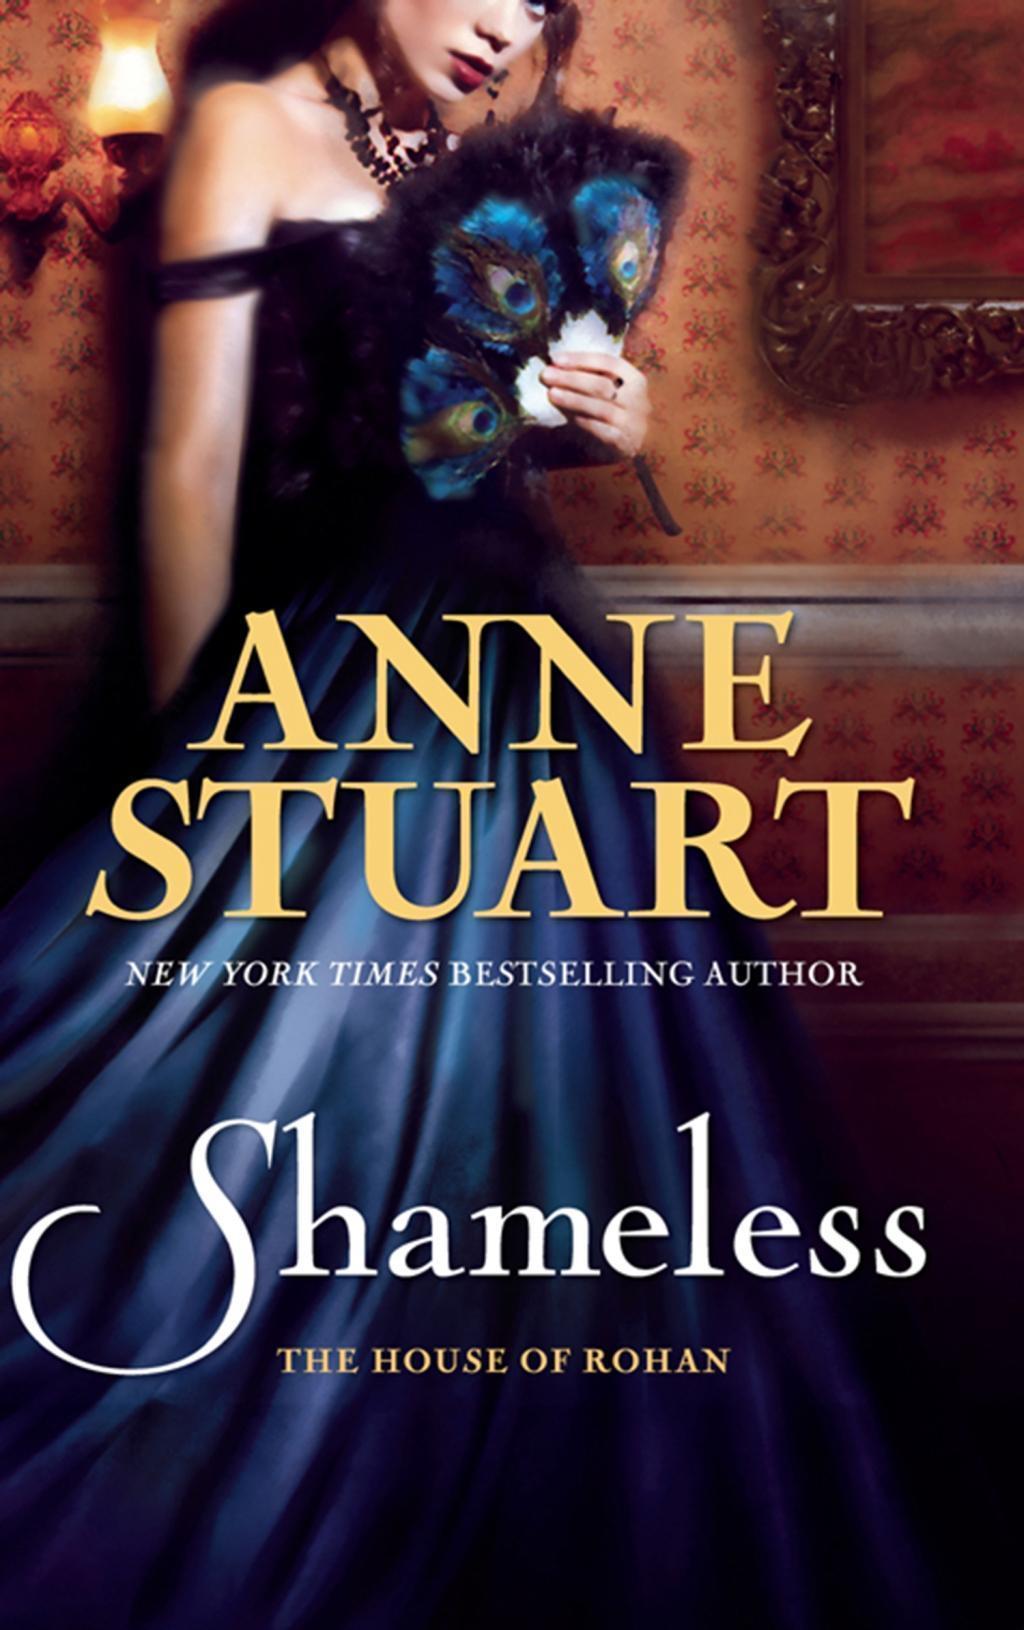 Shameless (Mills & Boon M&B) (The House of Rohan, Book 5)